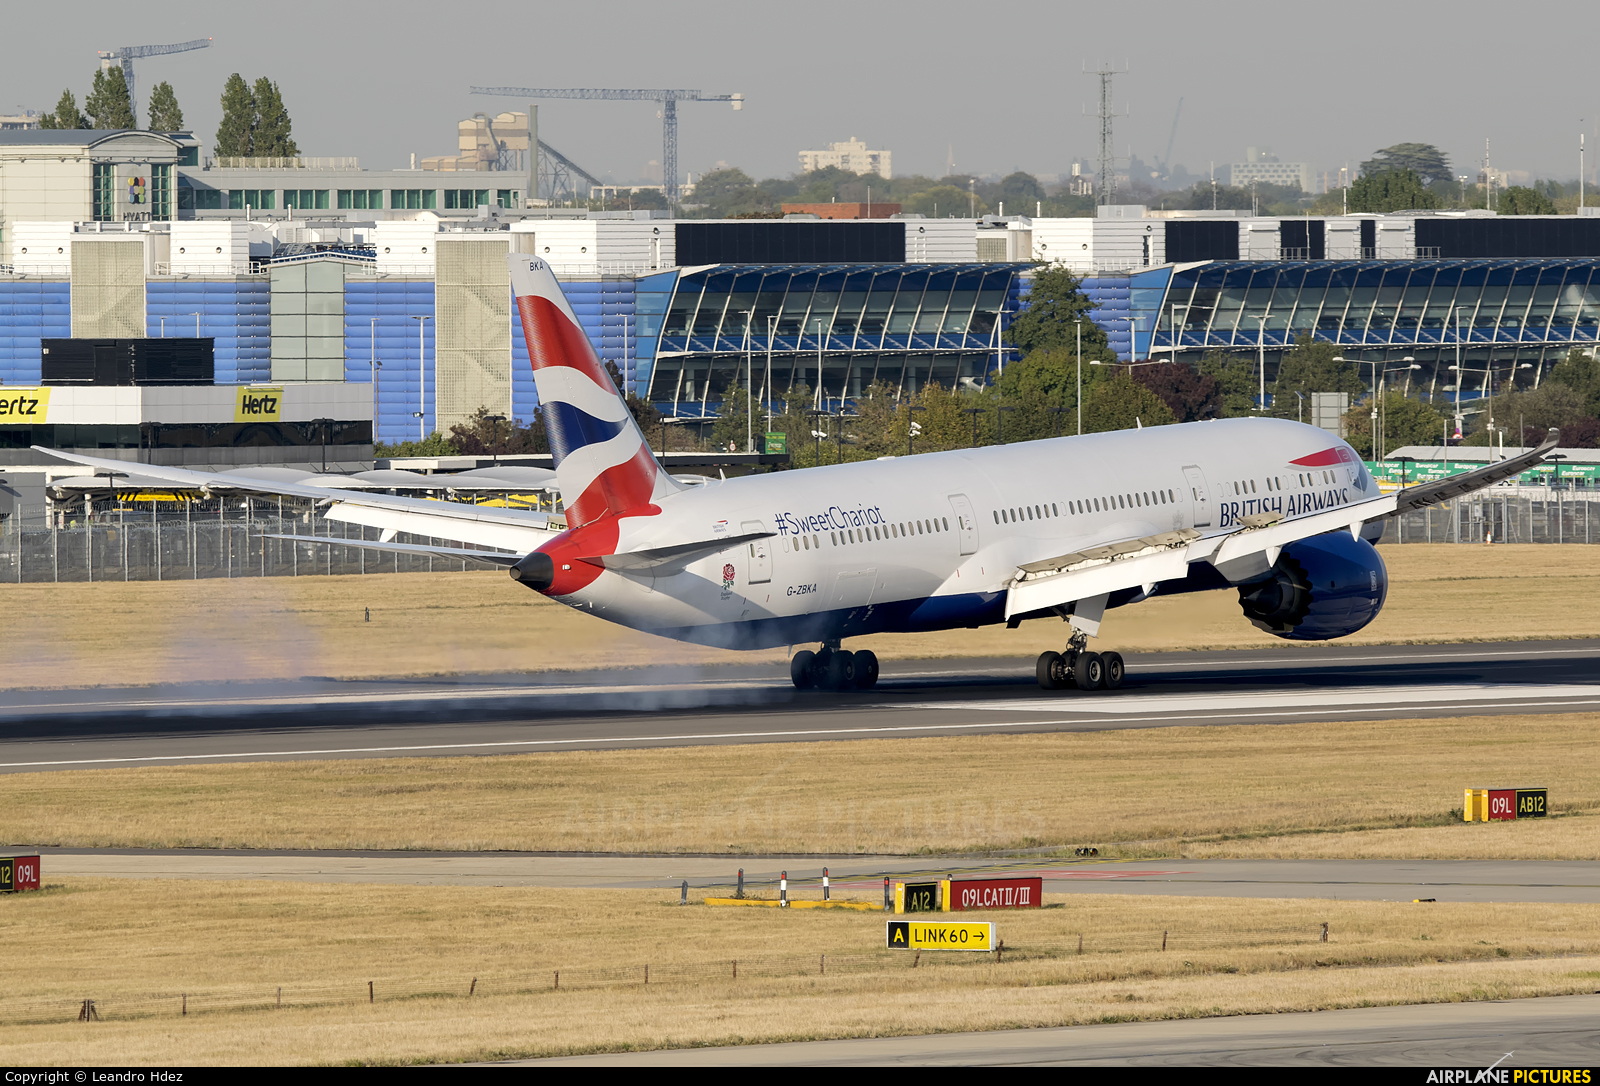 British Airways G-ZBKA aircraft at London - Heathrow